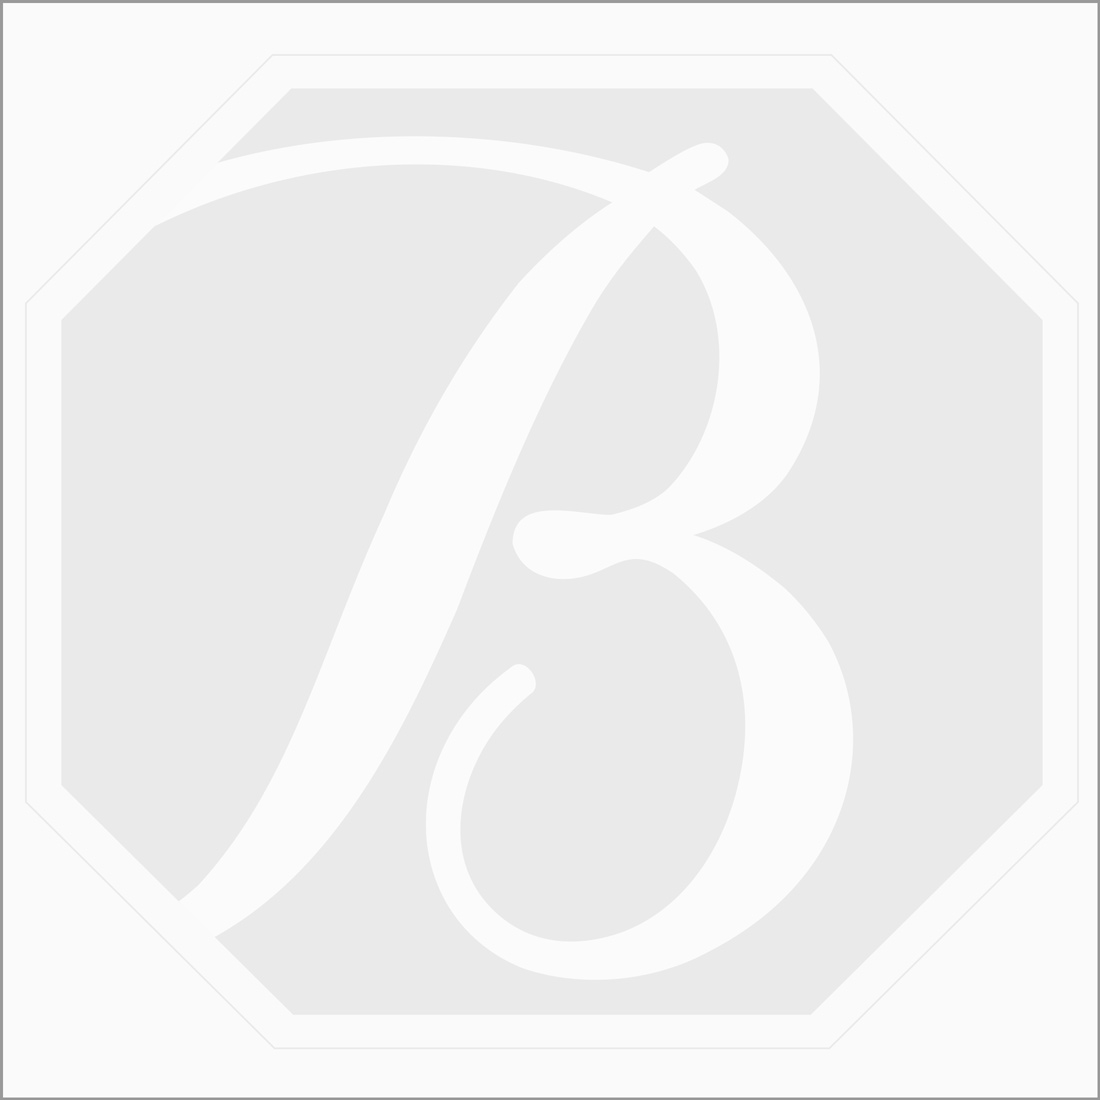 2 Brown Diamond Cushion Shape Rose Cut Diamonds - 3.78 cts. (DRC1286)